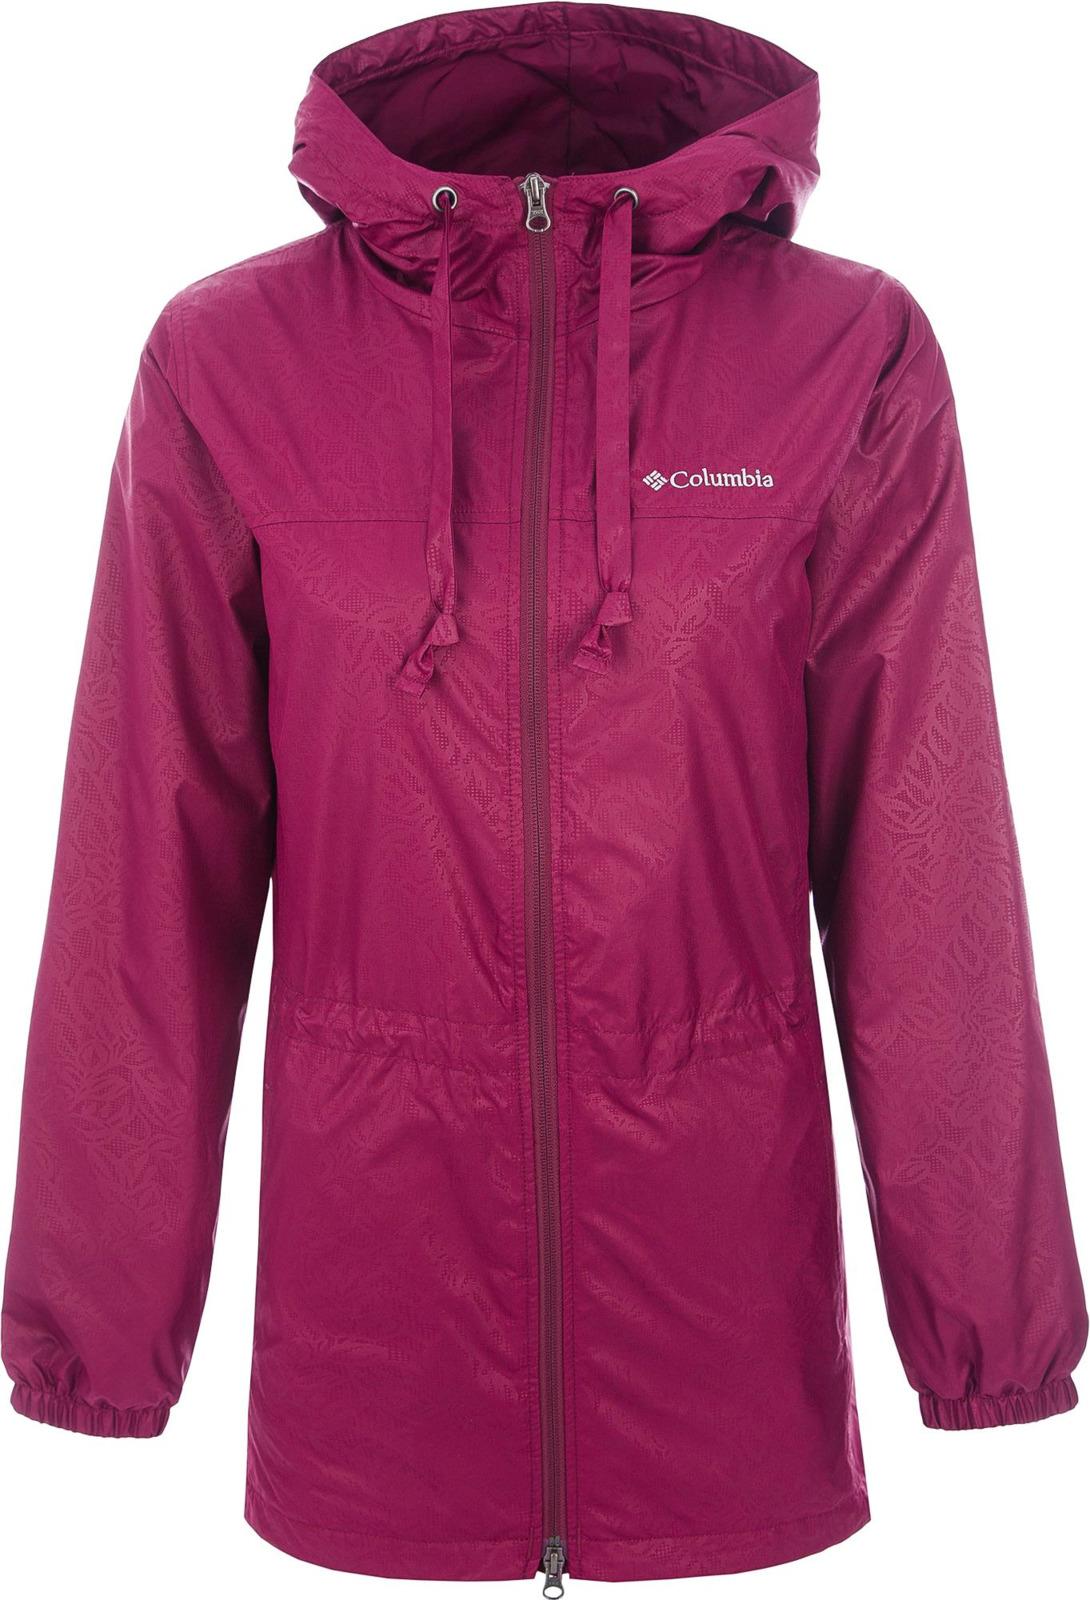 Ветровка Columbia Auroras Wake III Long Rain Jacket плащ женский columbia pardon my trench rain jacket цвет серый 1839841 027 размер xs 42